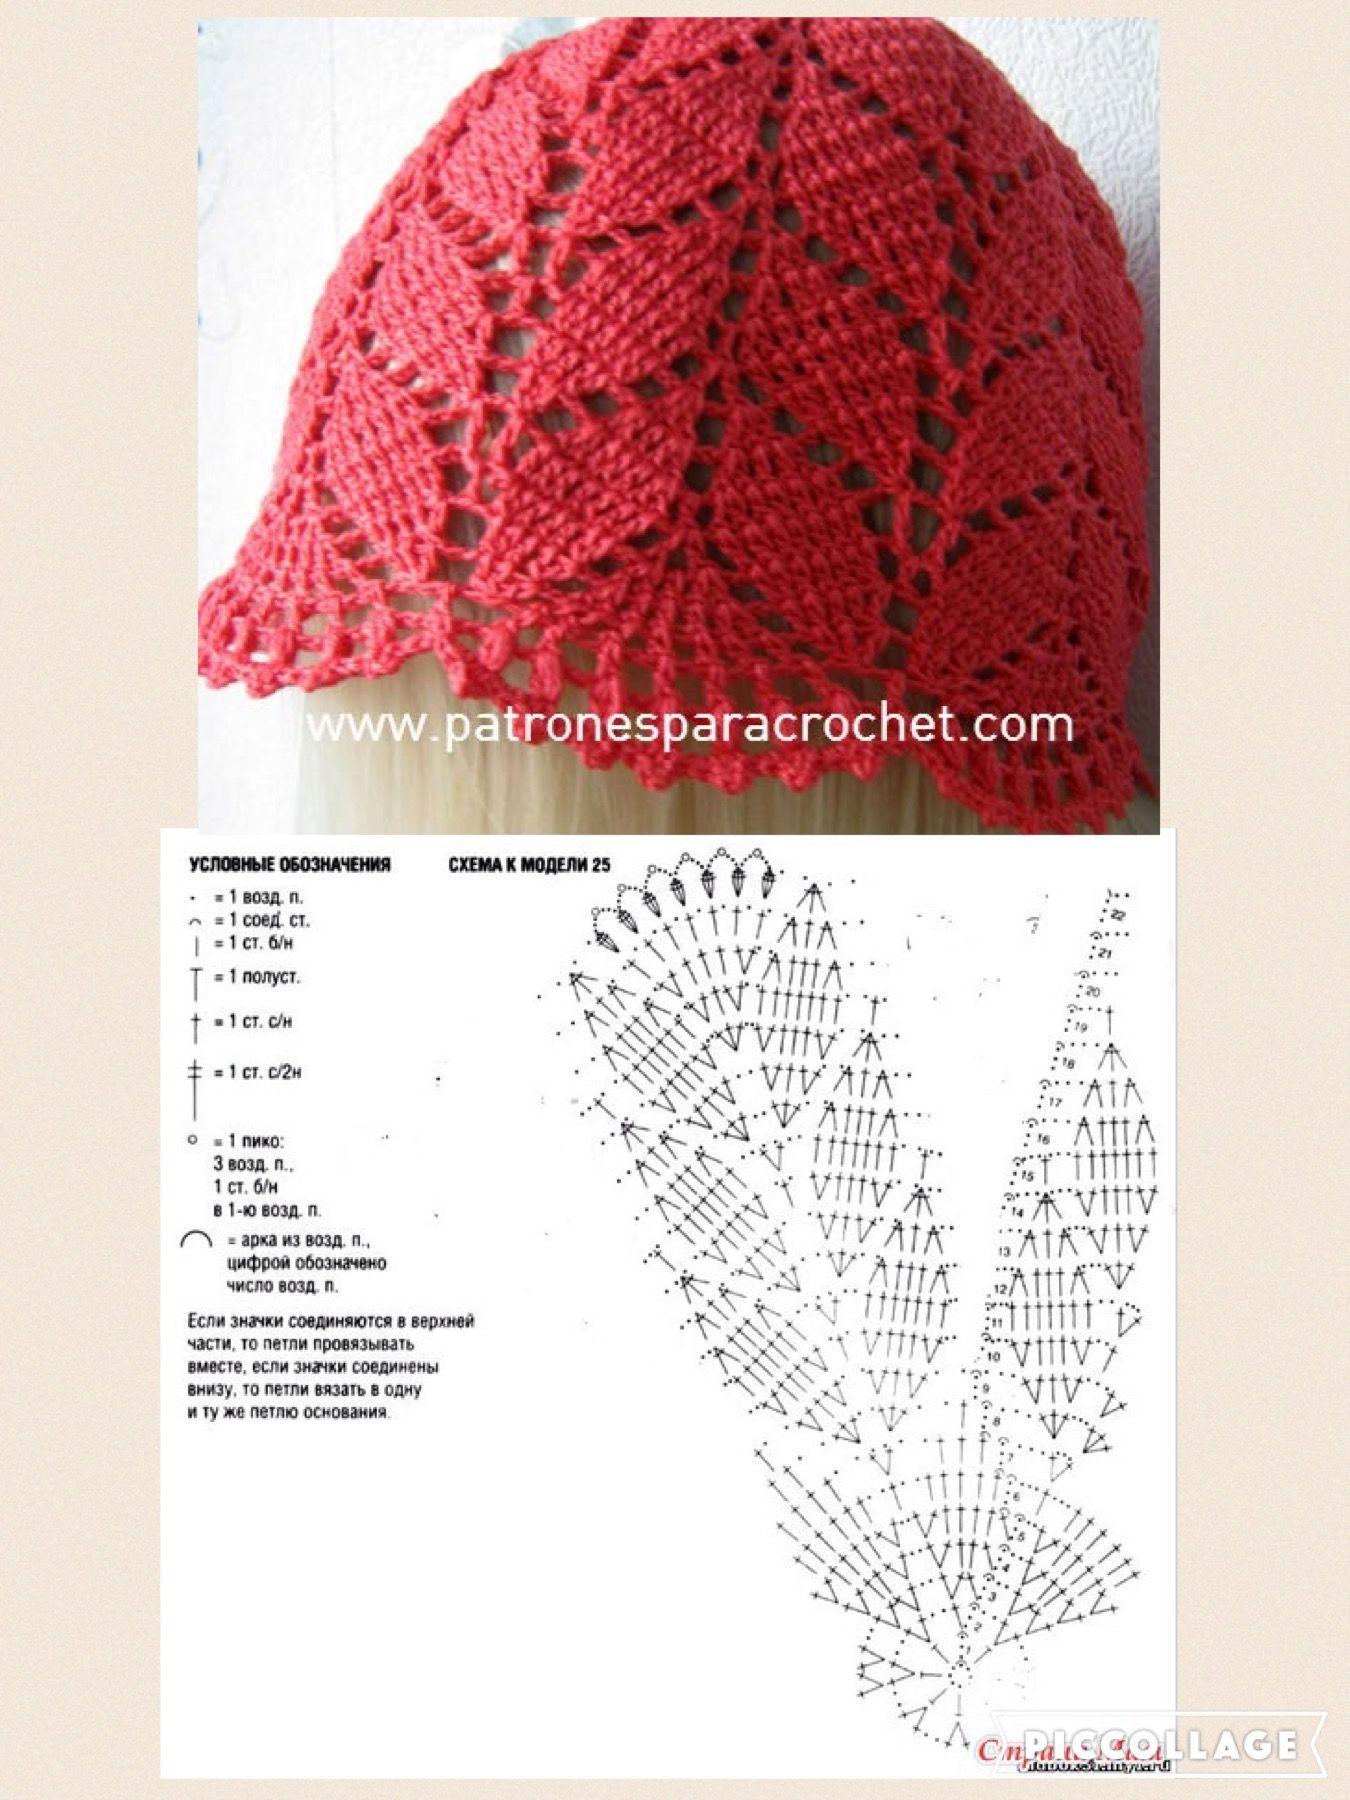 Pin de M.Eugenia en gorros | Pinterest | Croché, Gorro tejido y ...